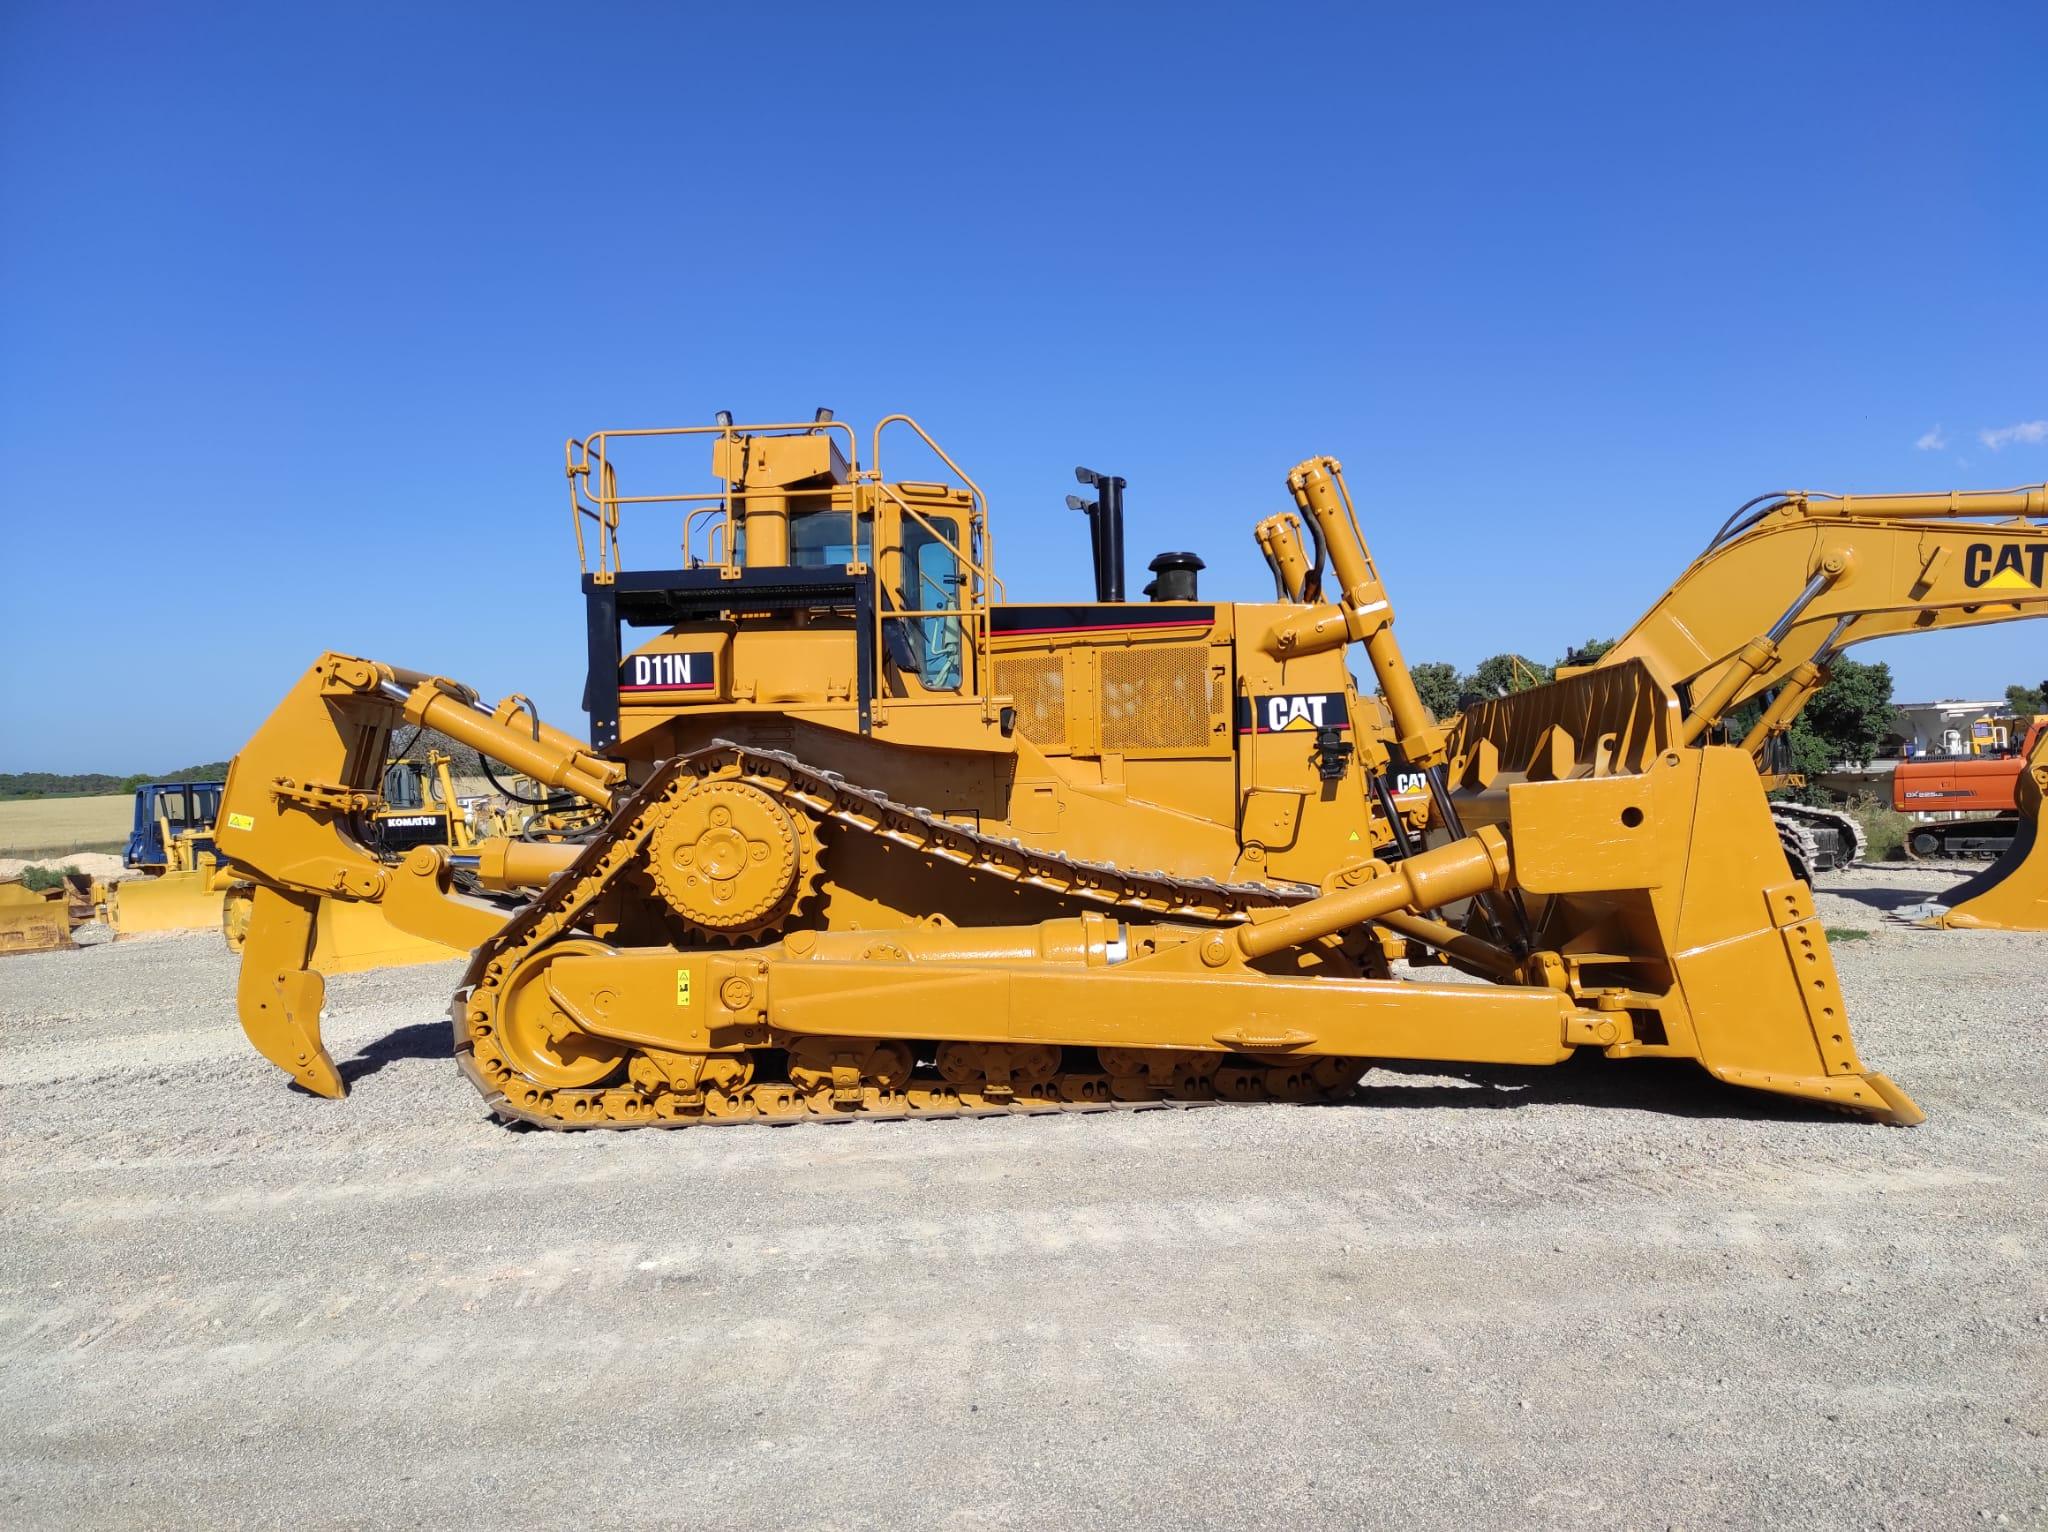 1989-caterpillar-d11n-equipment-cover-image